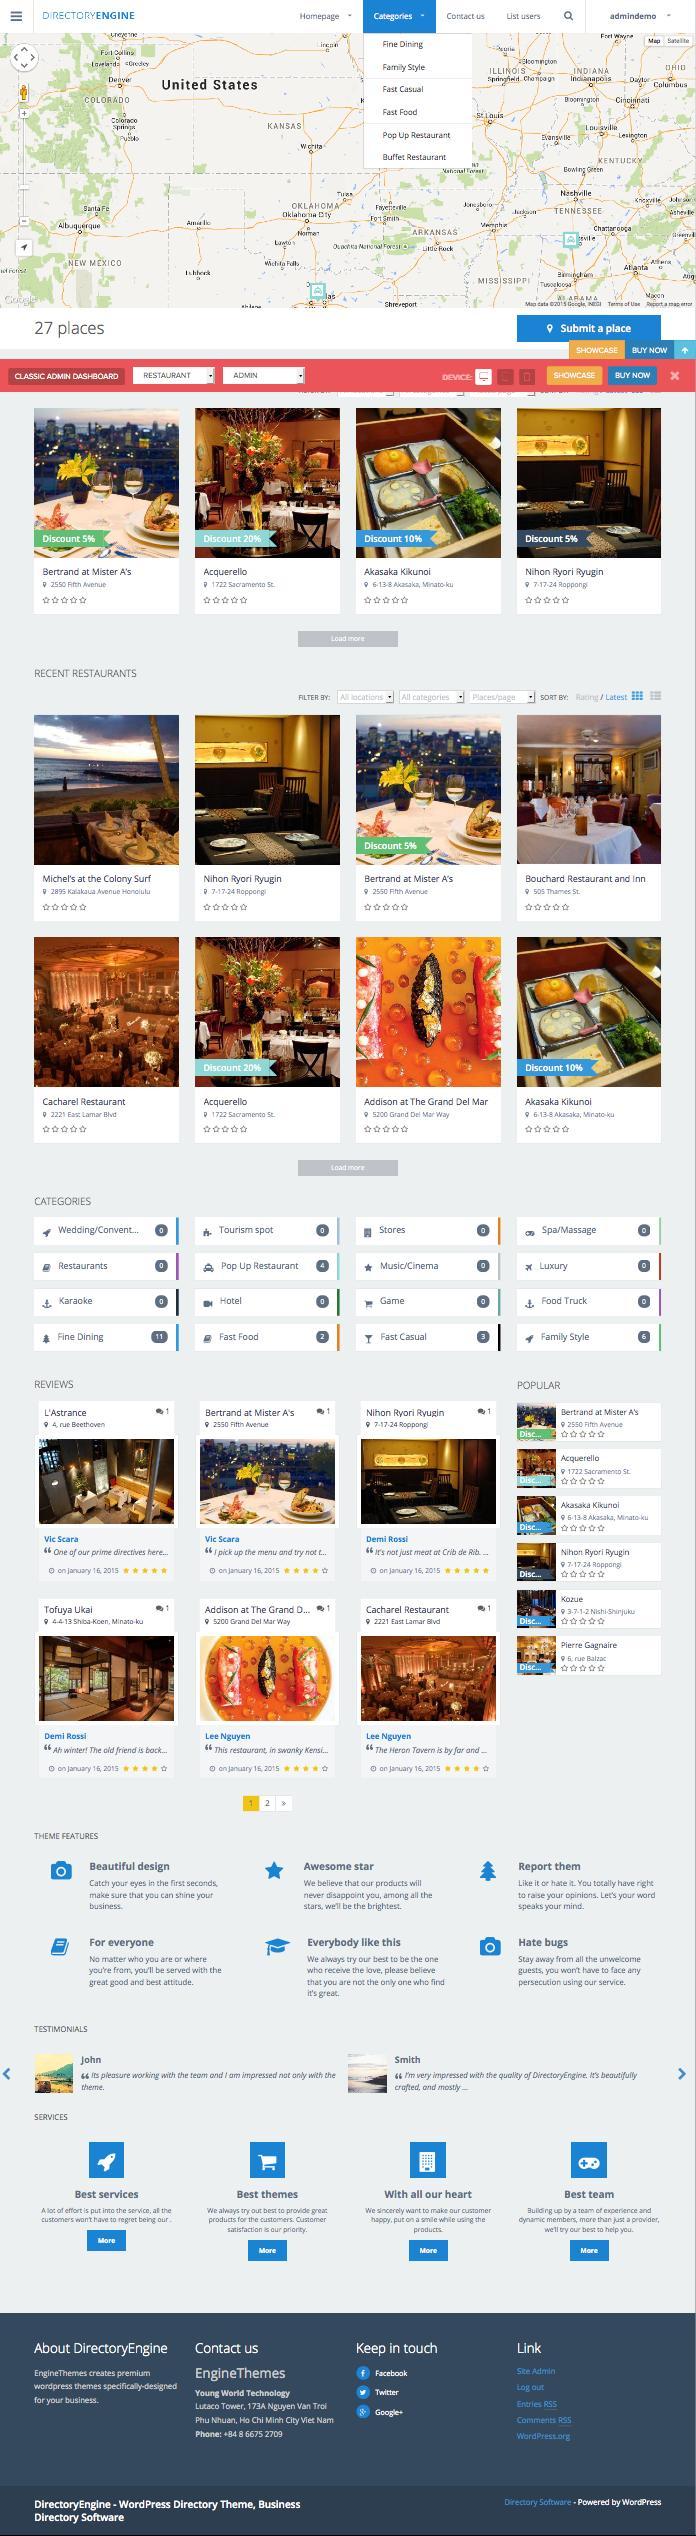 DirectoryEngine WordPress City Places Listing Theme